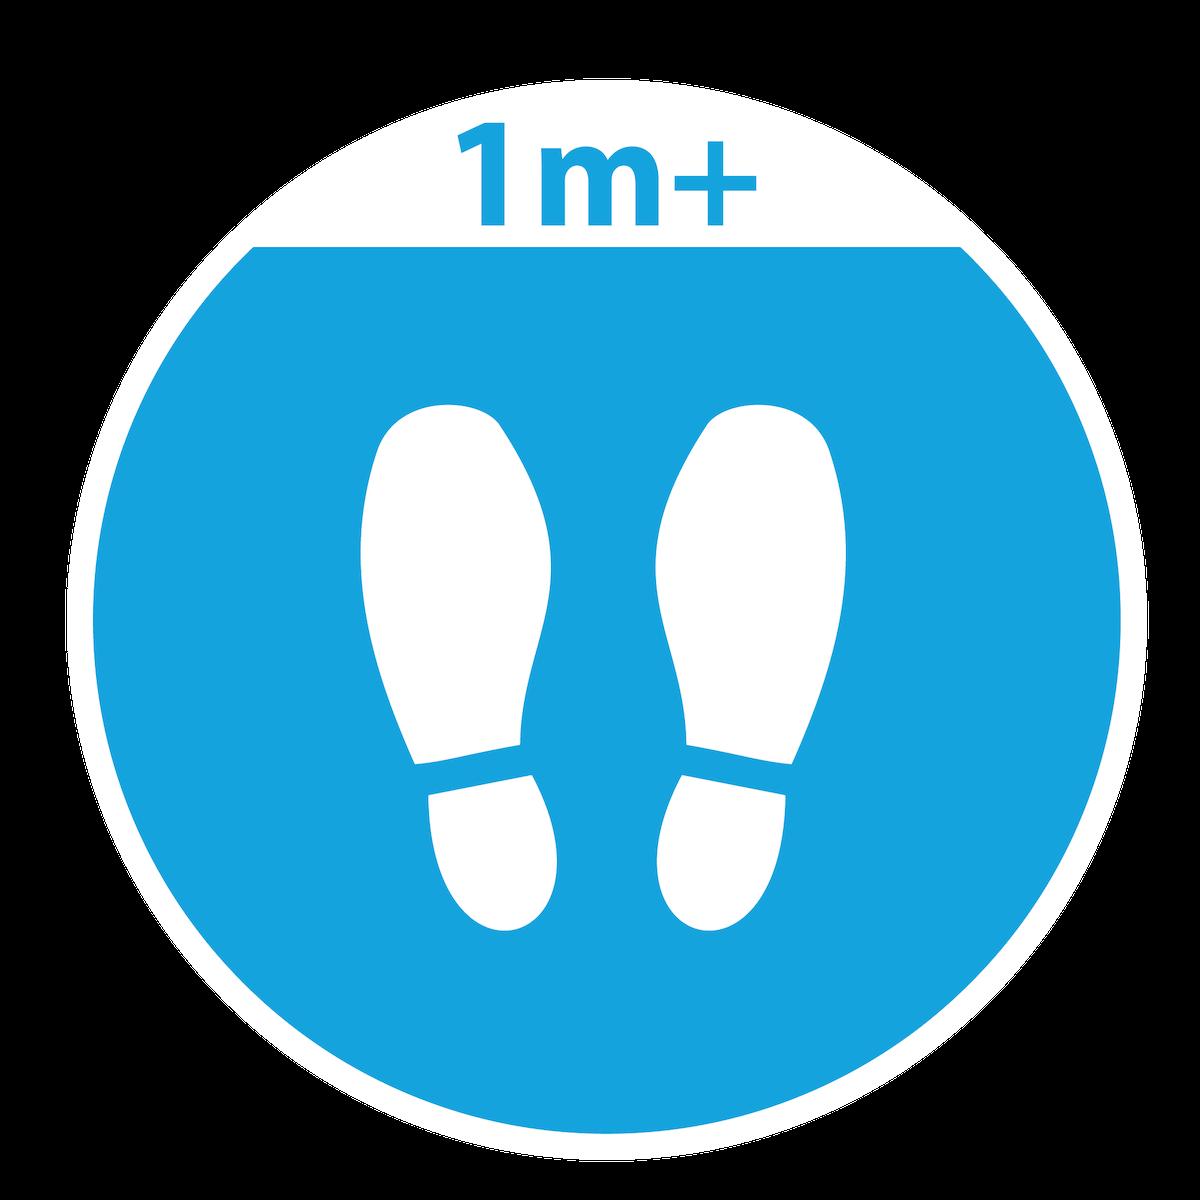 Playground Marking Blue Footprints Social Distance Marker